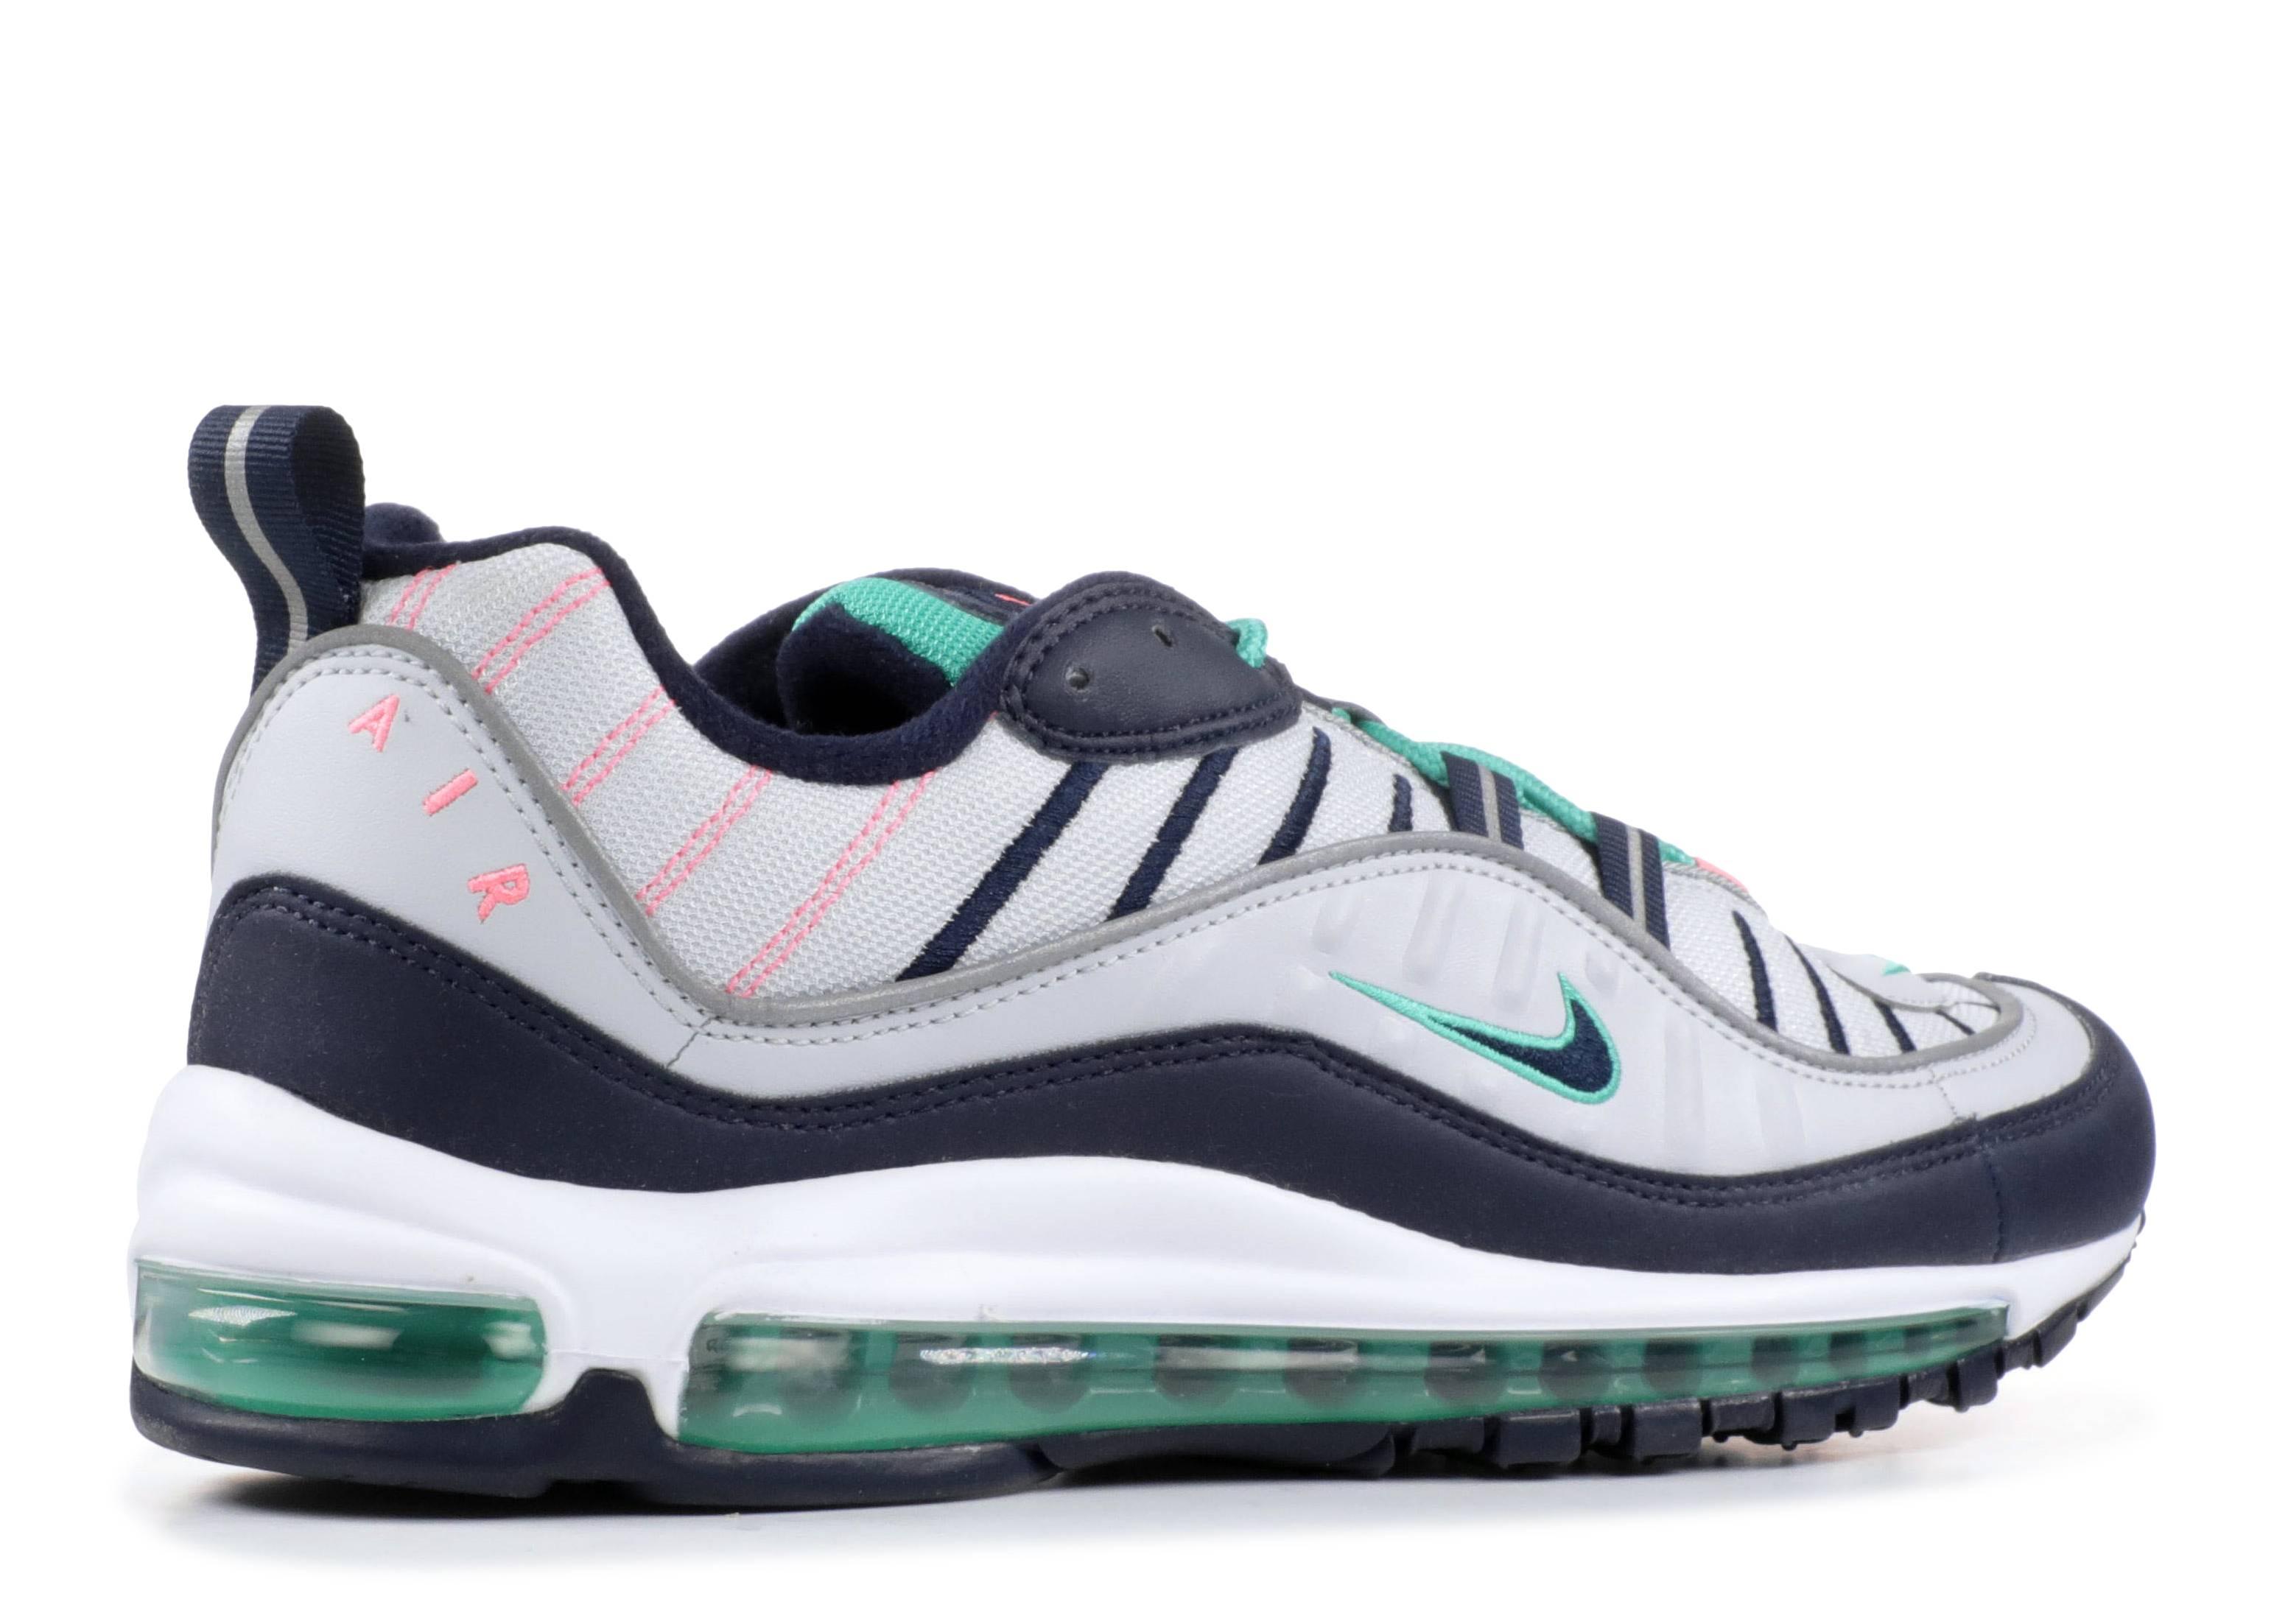 size 40 53689 12dff Nike Air Max 98 - Nike - 640744 005 - pure platinum obsidian   Flight Club